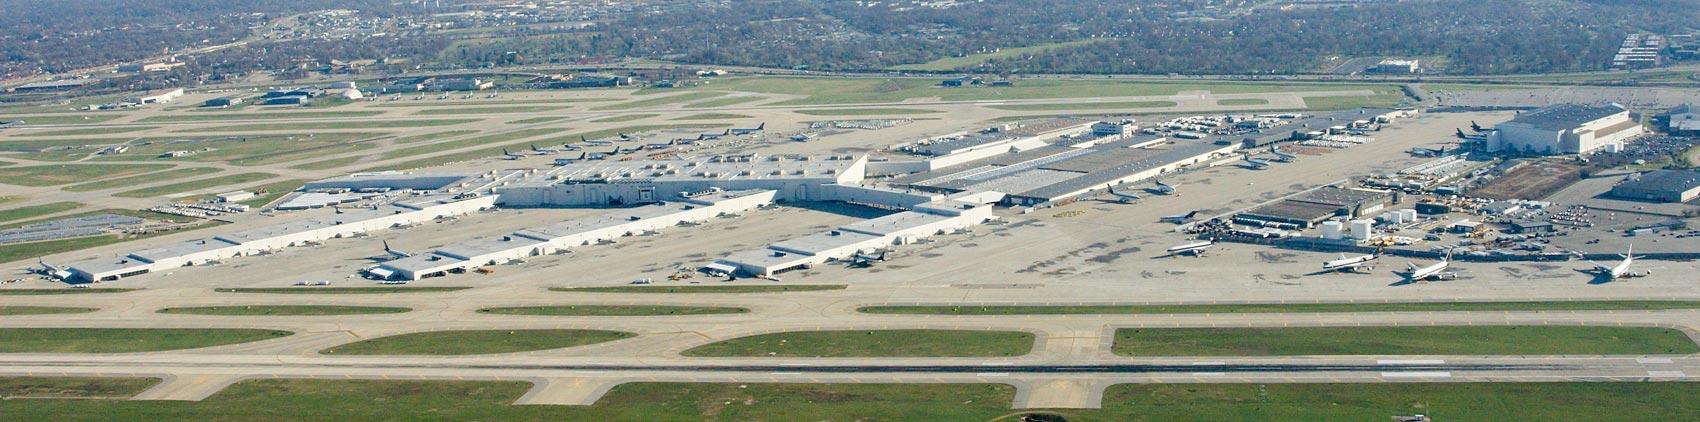 UPS Worldport Air Hub at Louisville Internatio...